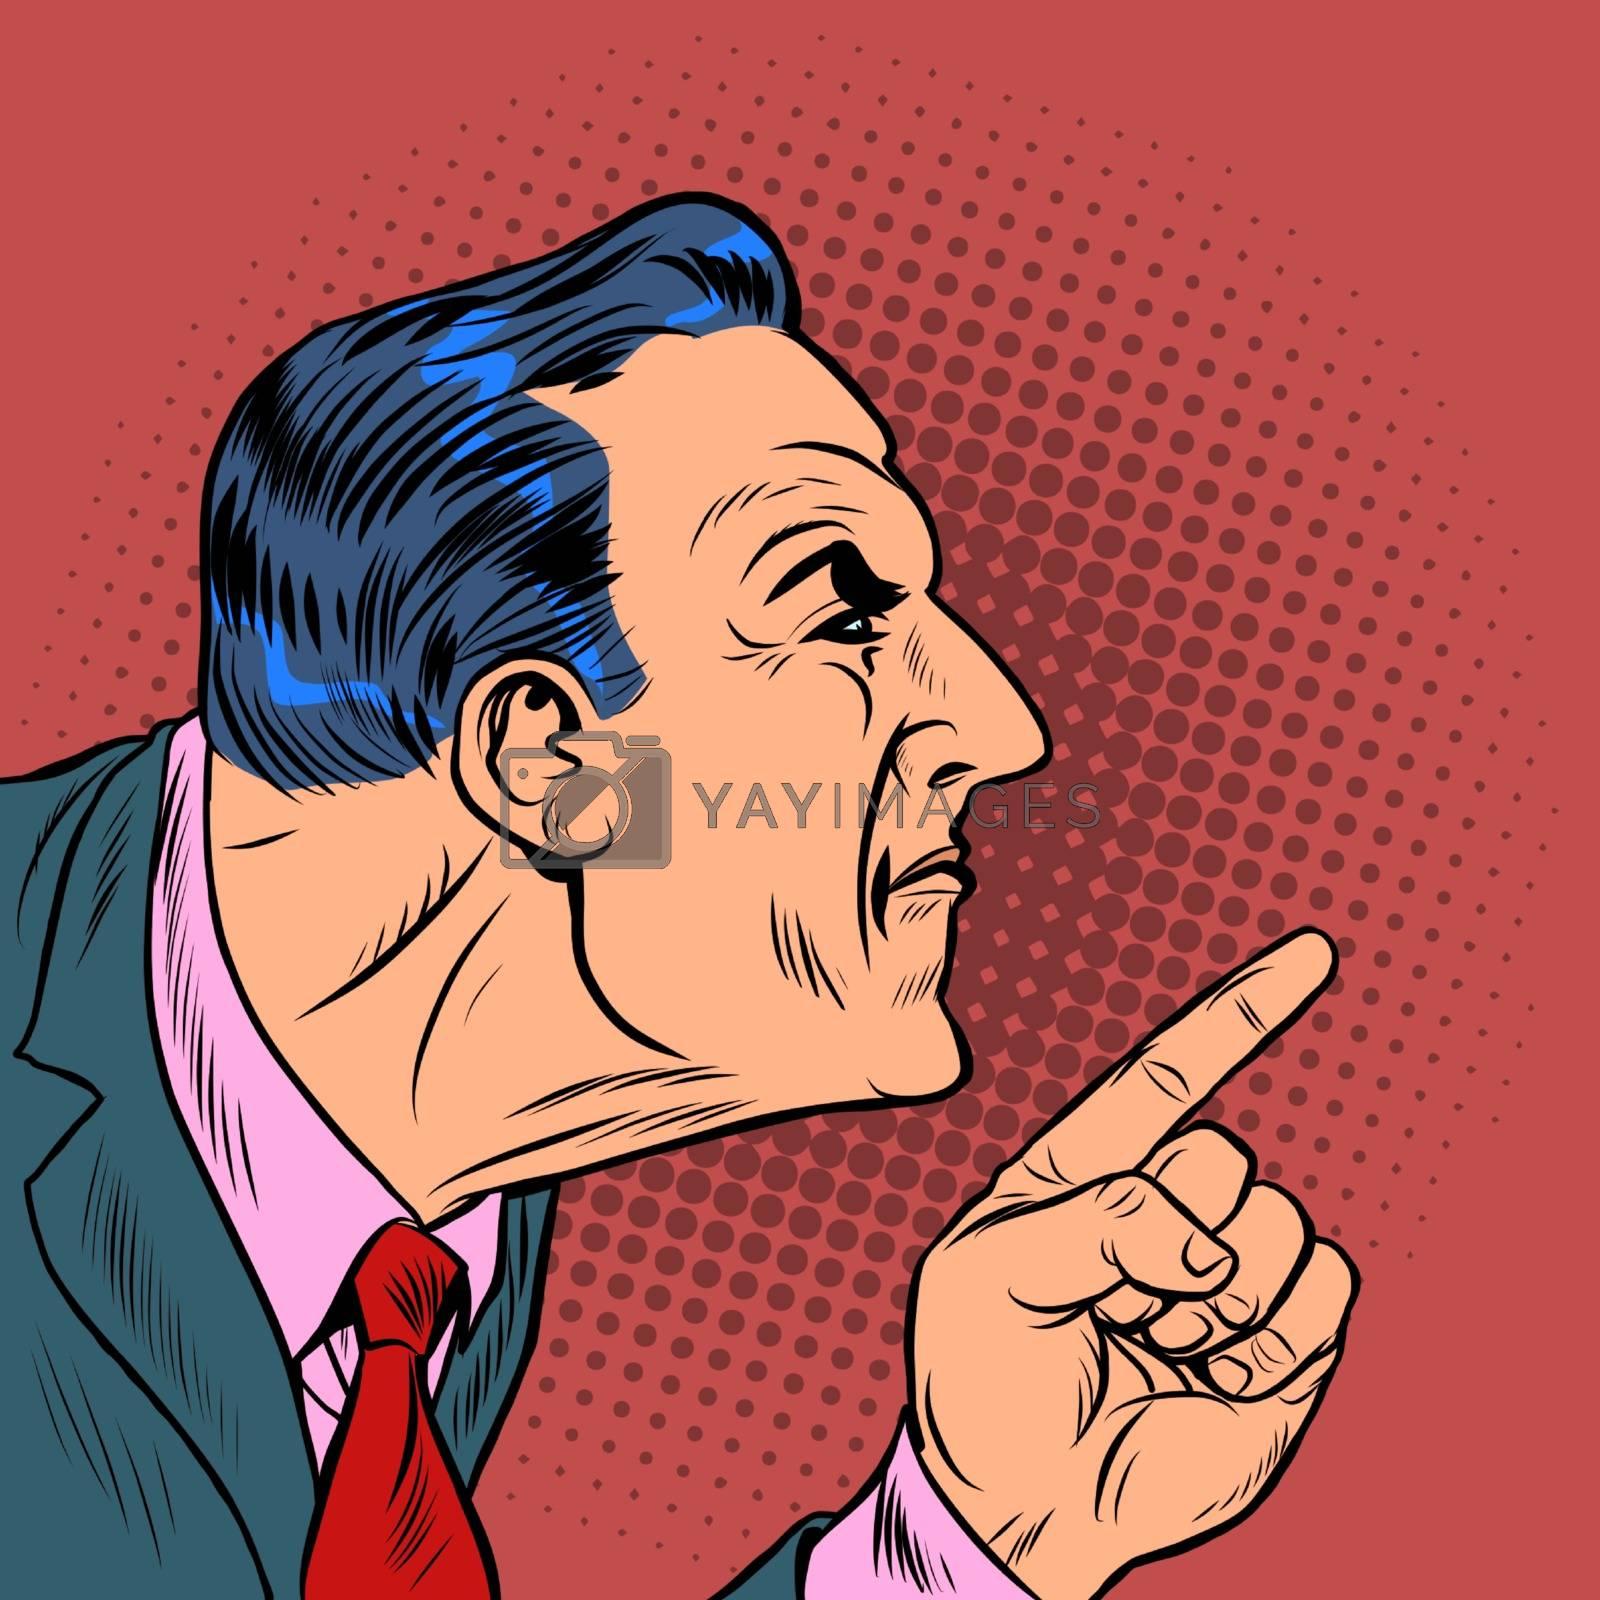 Angry man points finger. Pop art retro vector illustration kitsch vintage 50s 60s